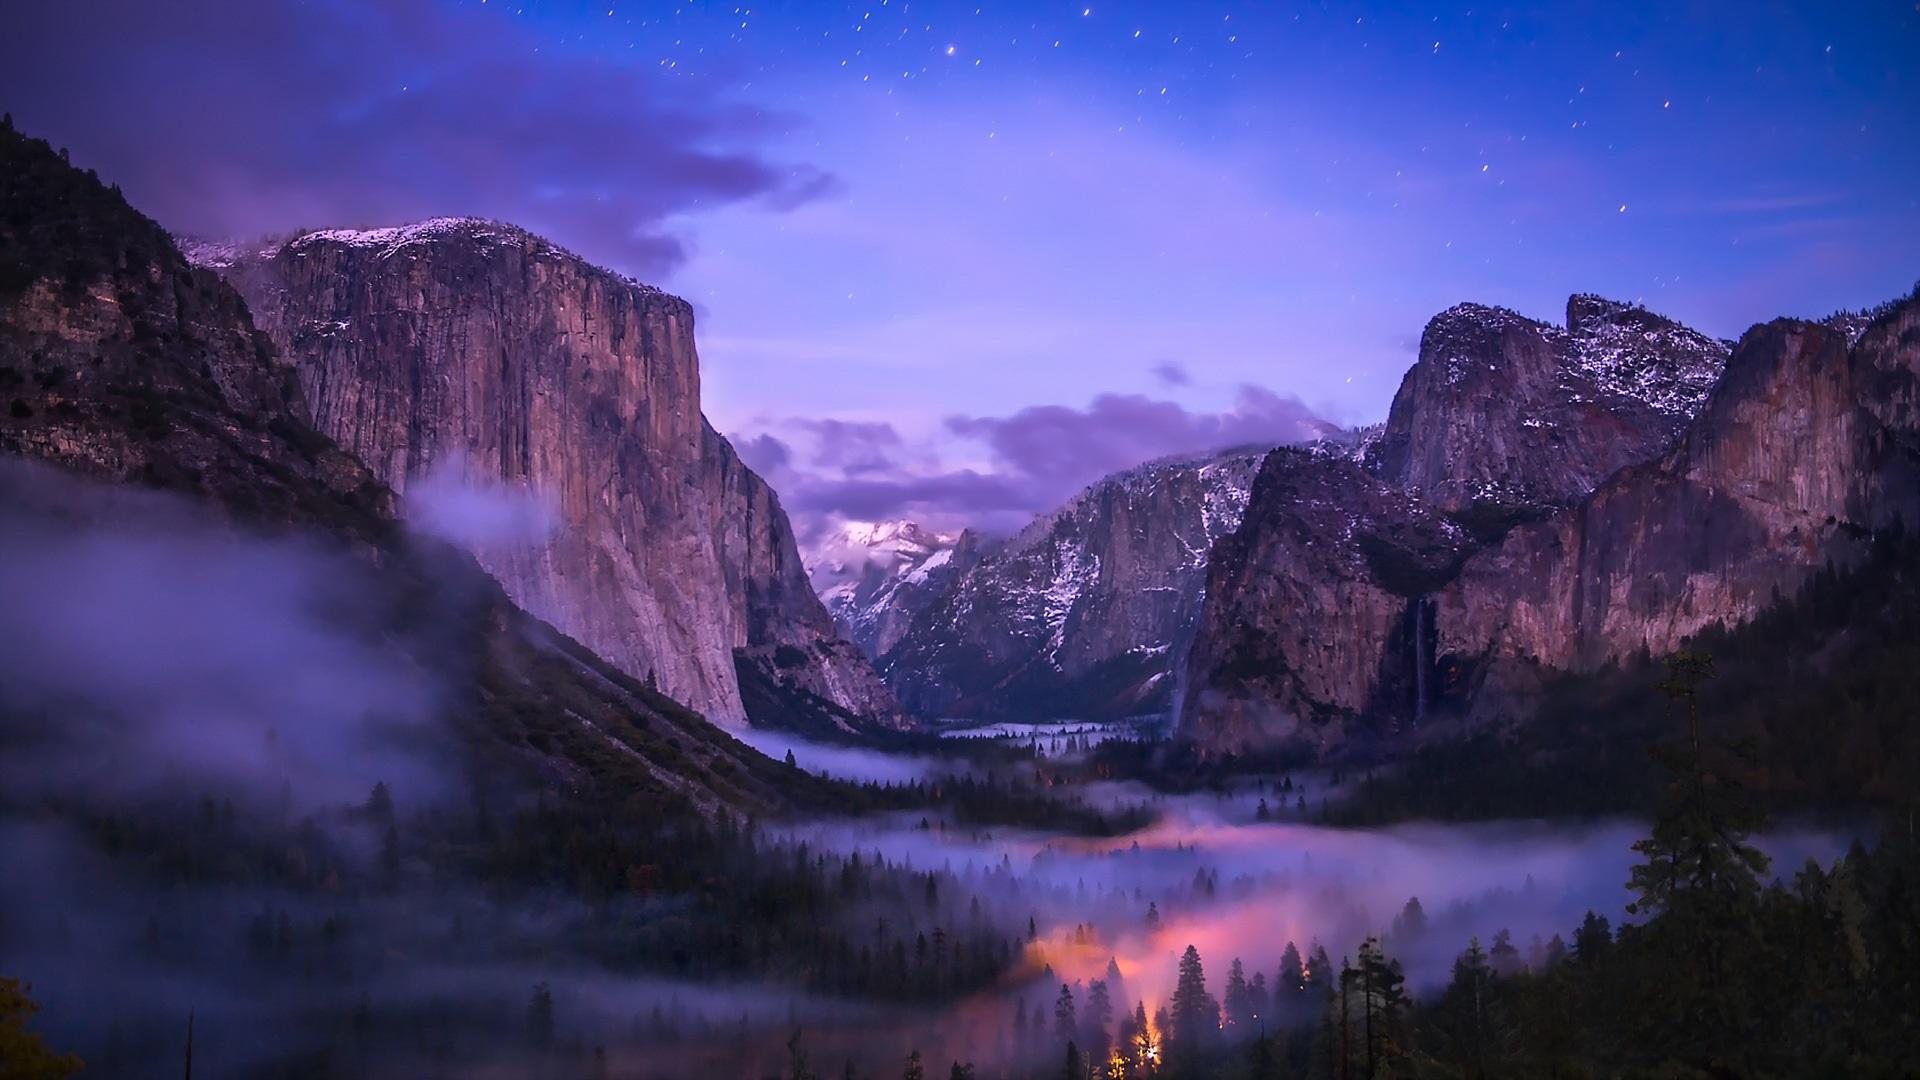 Yosemite Wallpapers Hd  Pixelstalknet